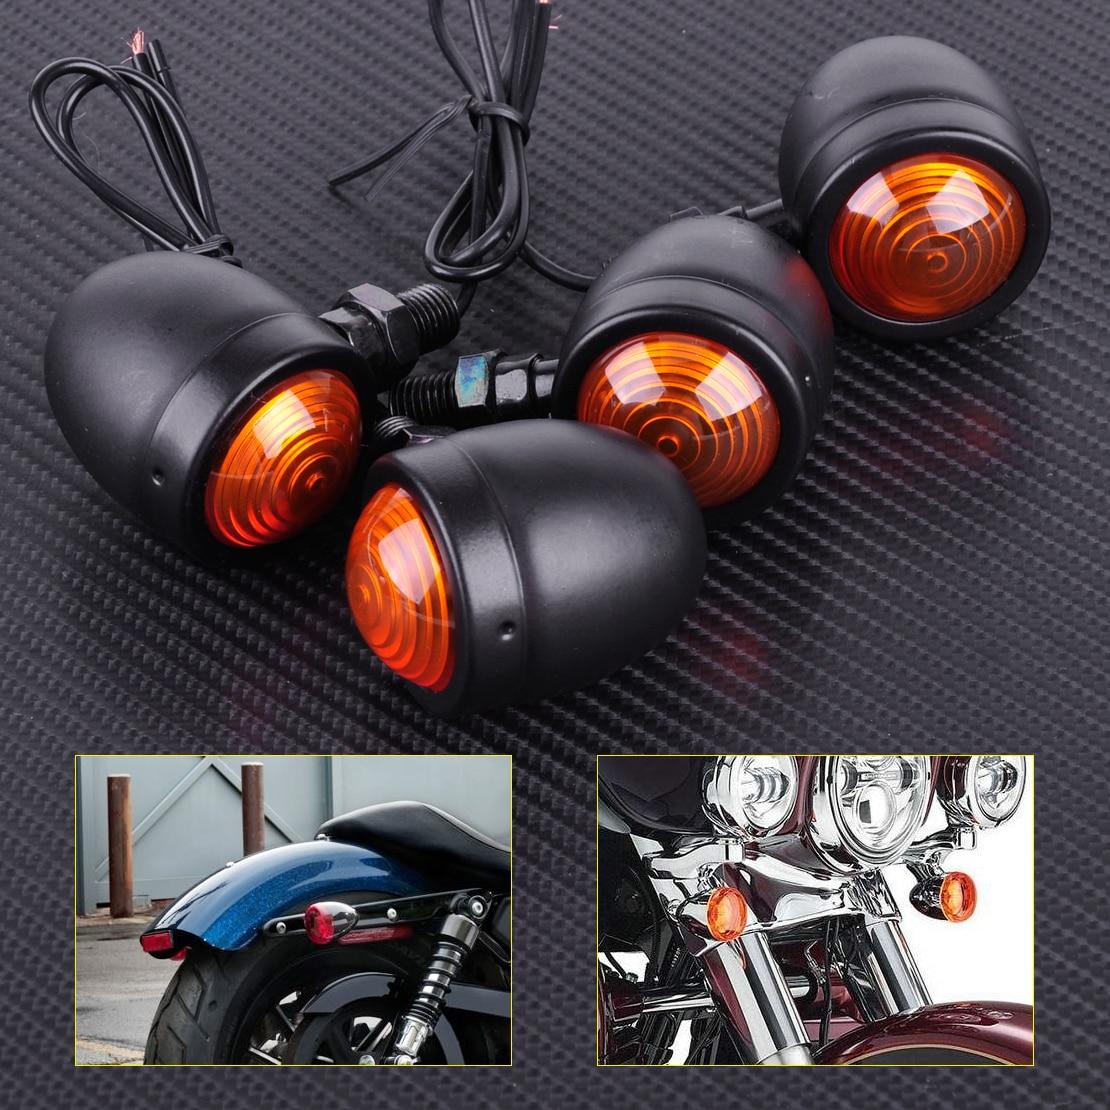 CITALL Motorcycle 4pcs 12V Black Bullet Turn Signal Indicator Lights font b Lamp b font Fit